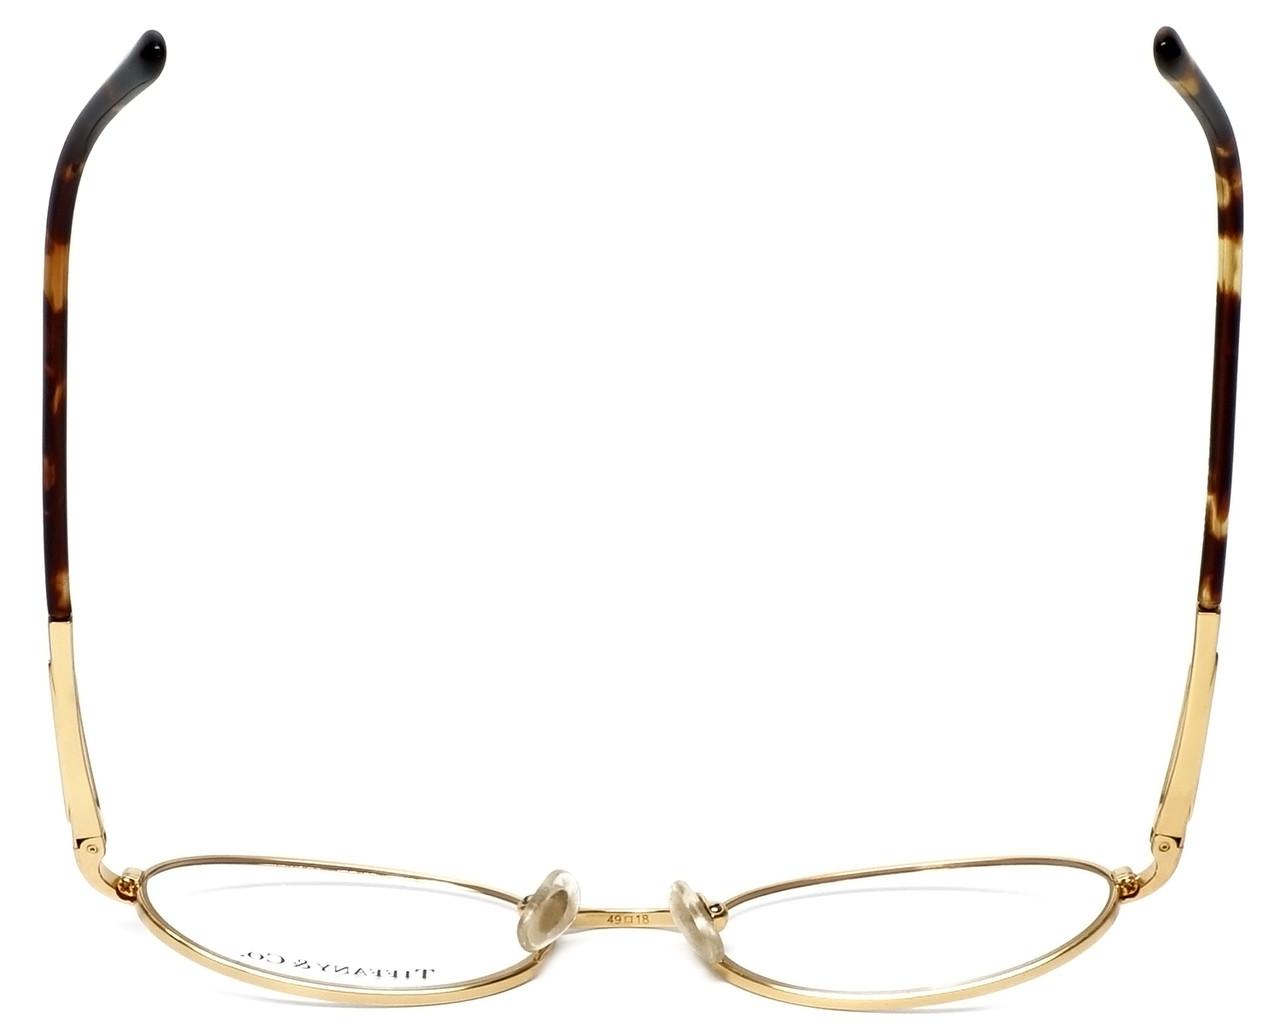 47b005dadc5 Tiffany Designer Reading Glasses TF1002-6002 in Gold 49mm - Speert ...